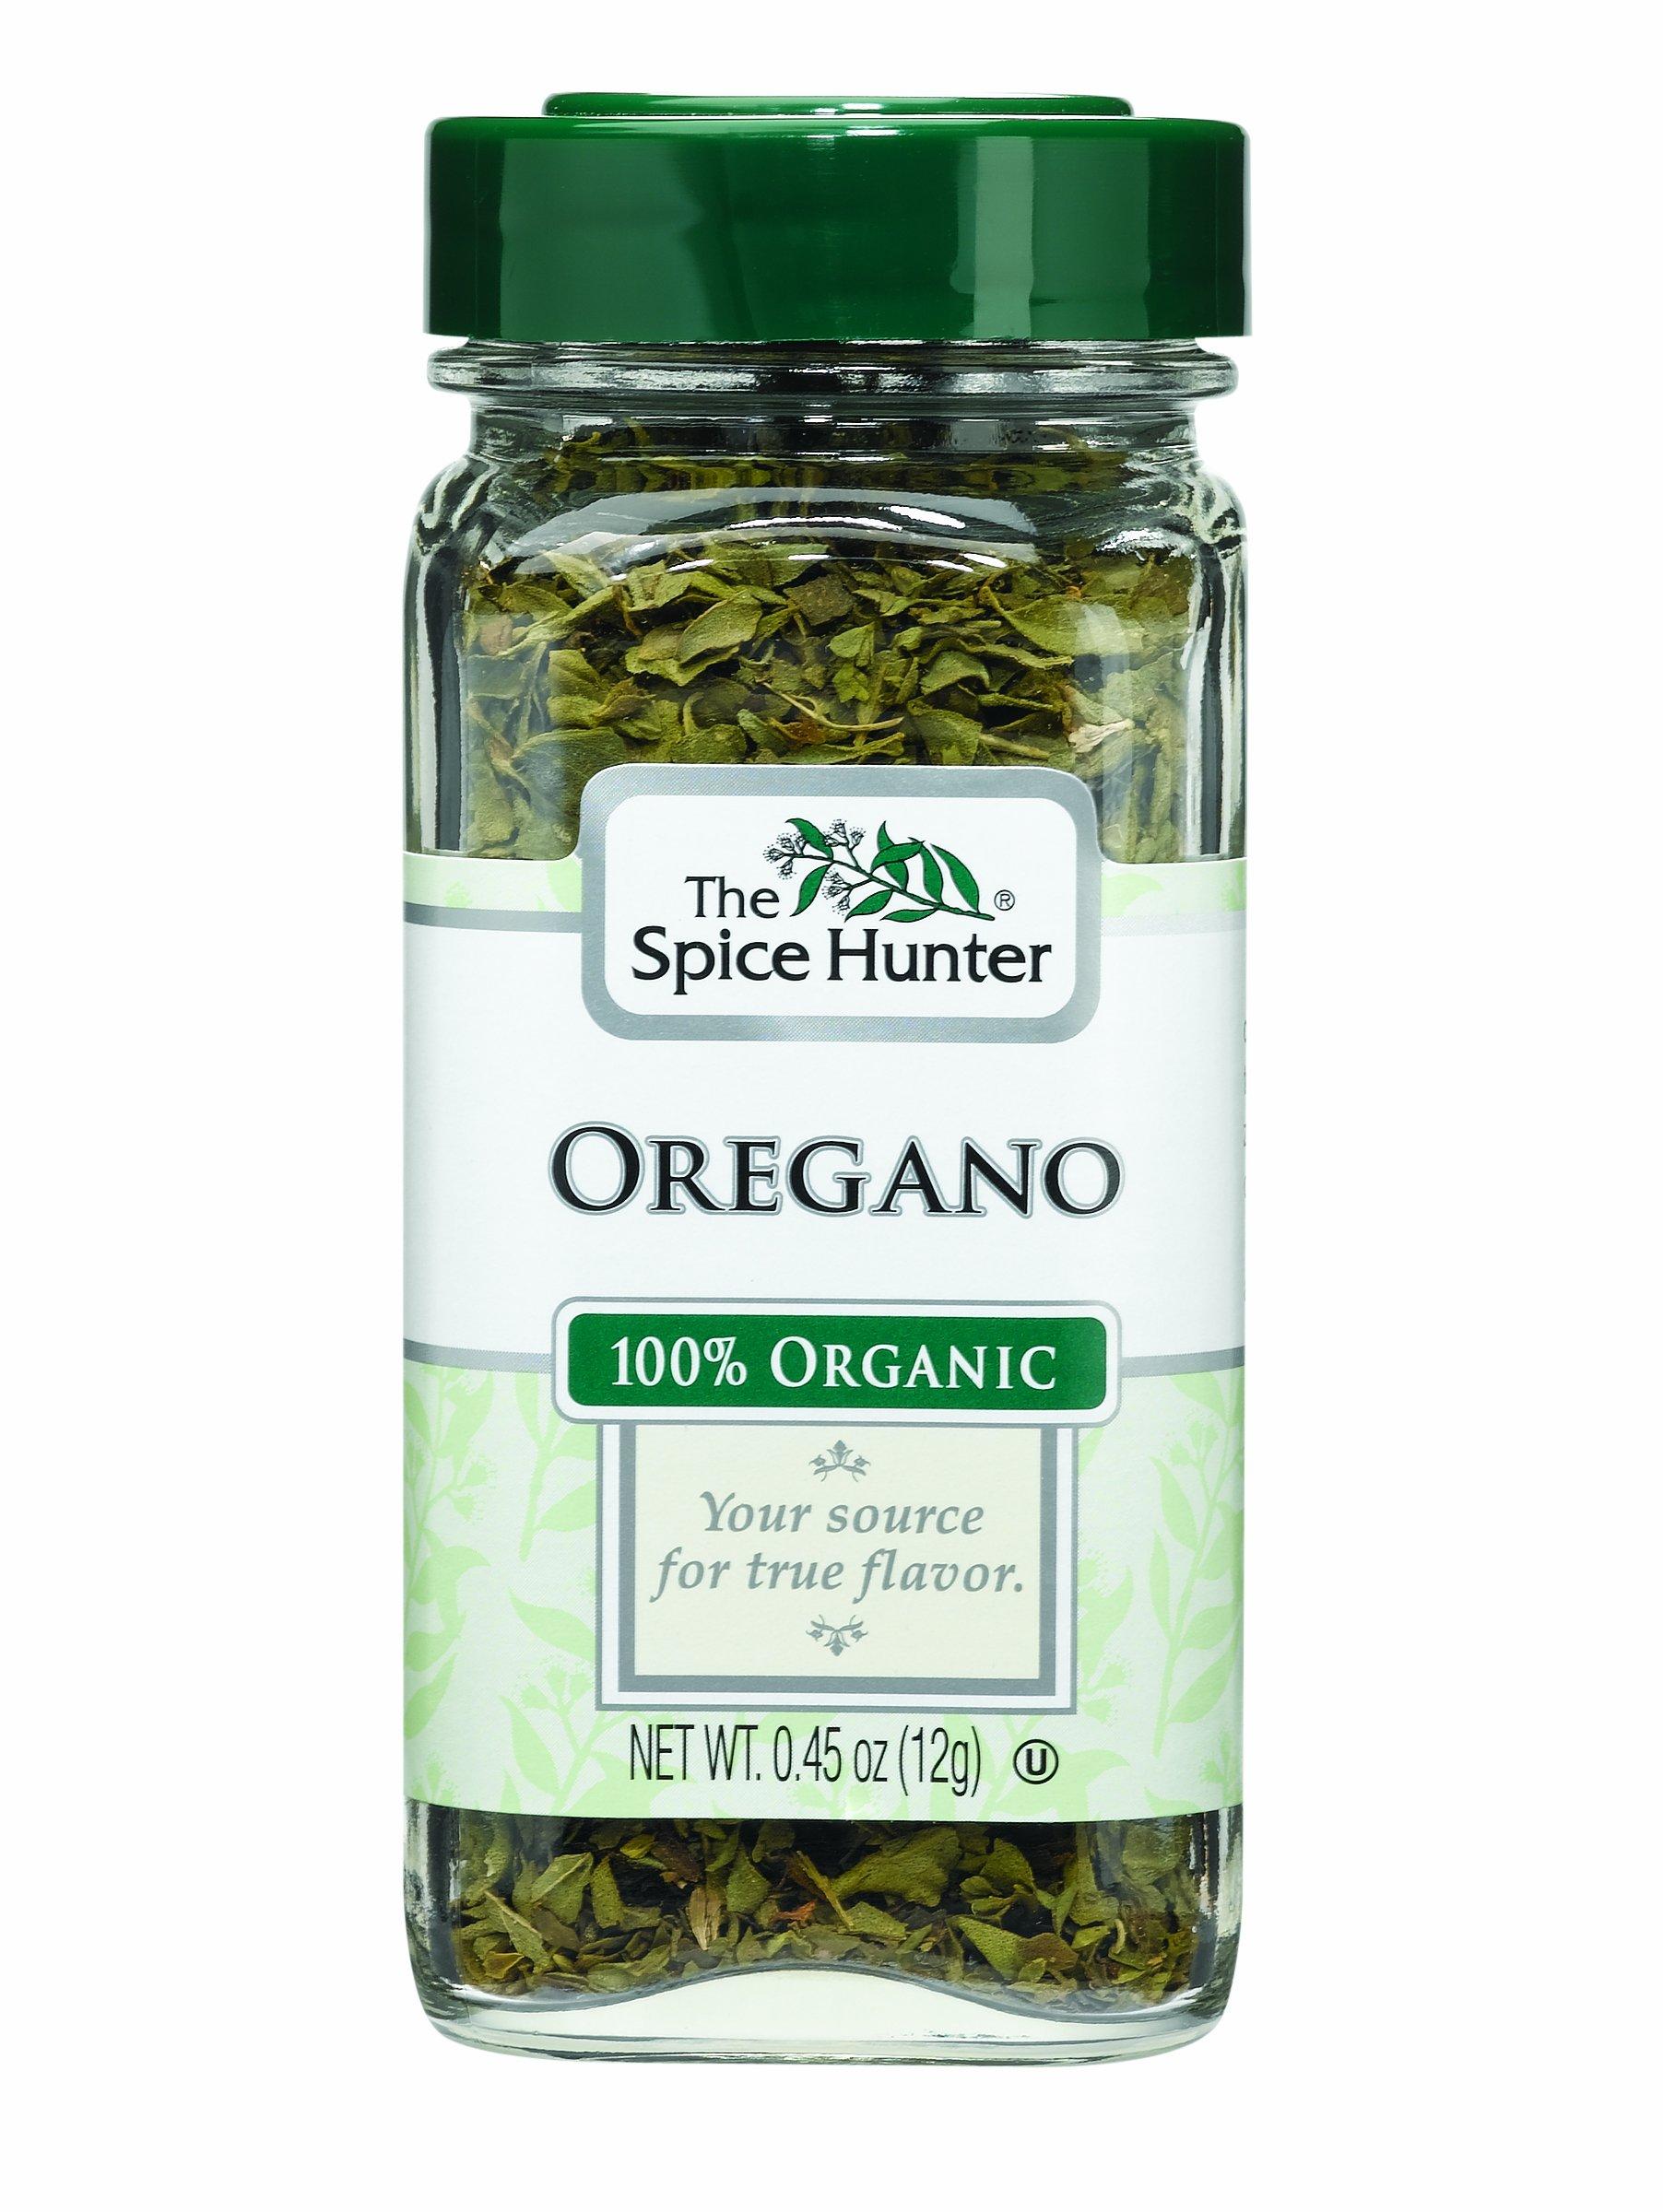 The Spice Hunter Oregano, Organic, 0.45-Ounce Jars (Pack of 6)